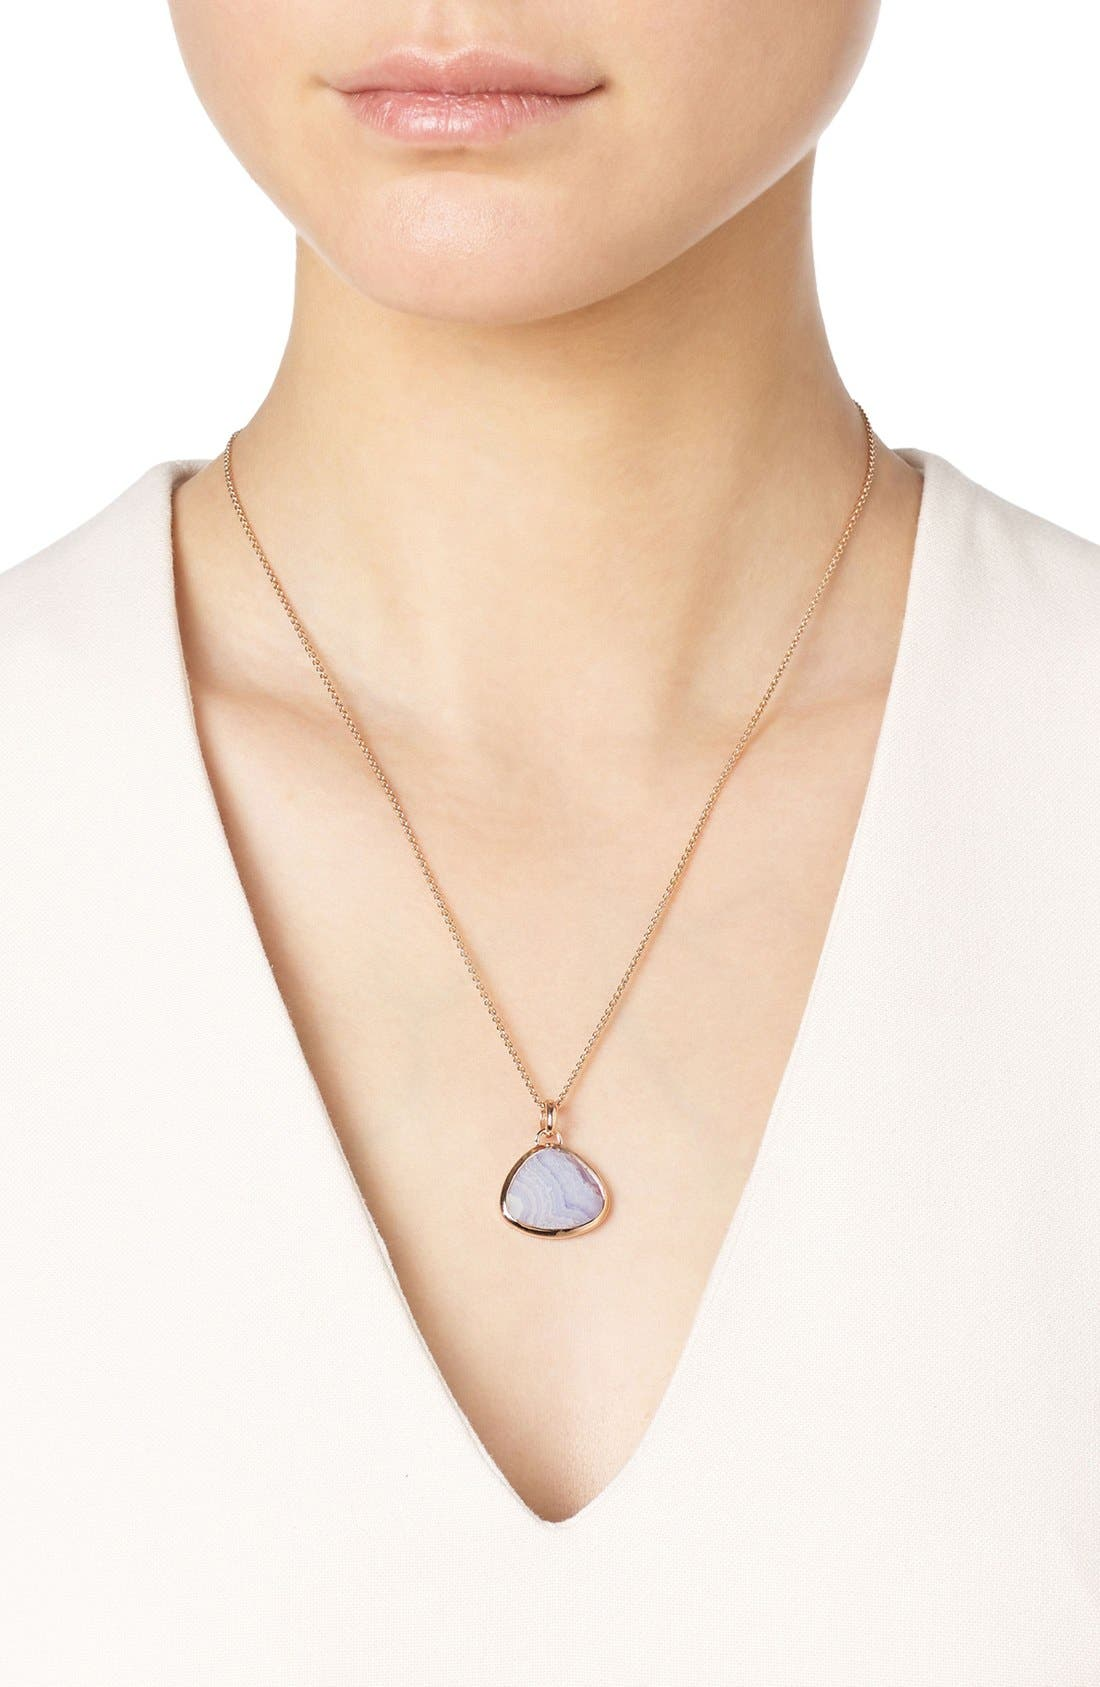 Siren Semiprecious Stone Pendant,                             Alternate thumbnail 2, color,